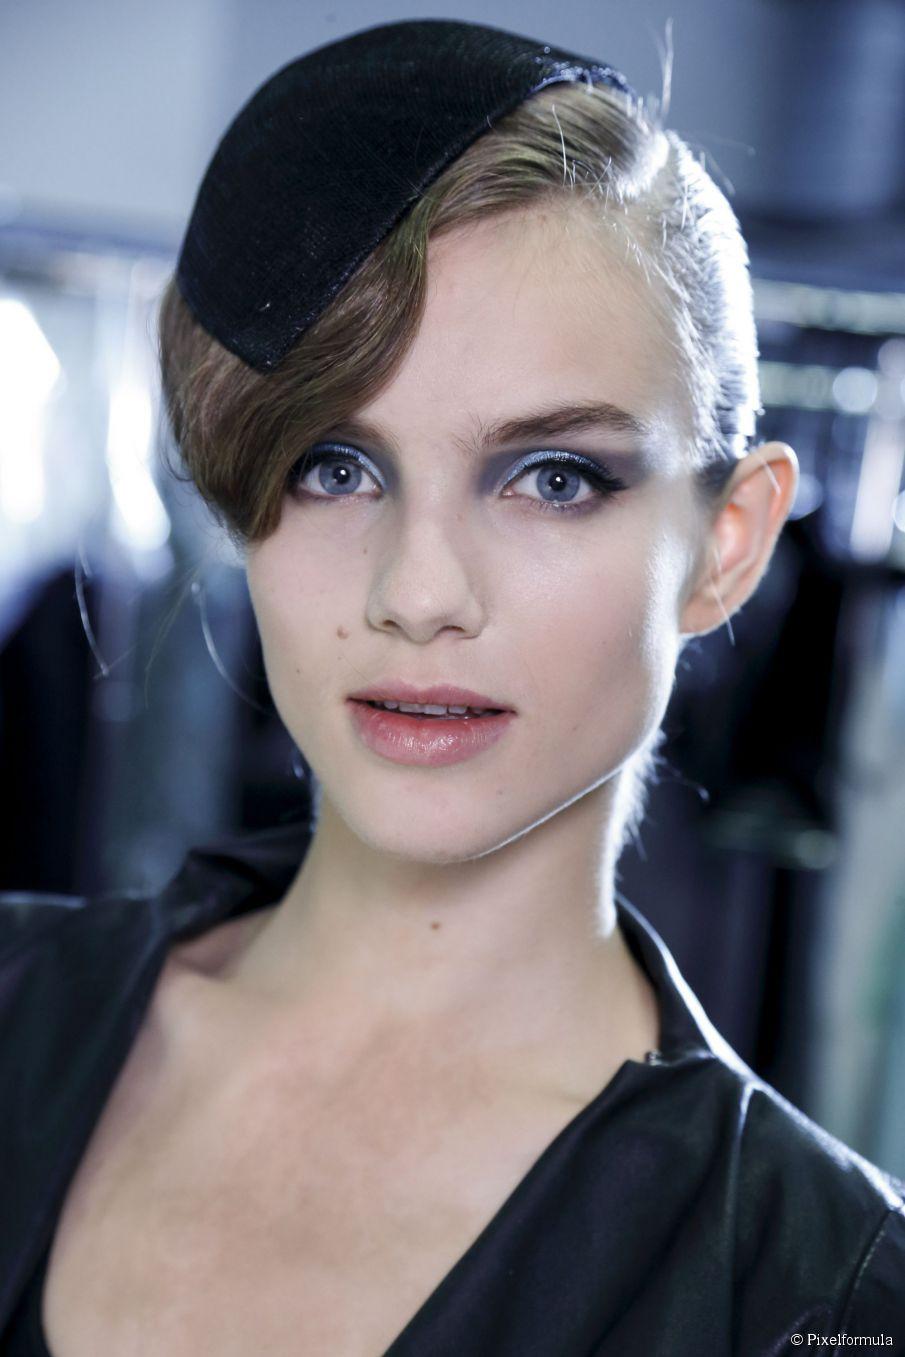 Kurze Haare Hochsteckfrisuren - Inspirationsgalerie